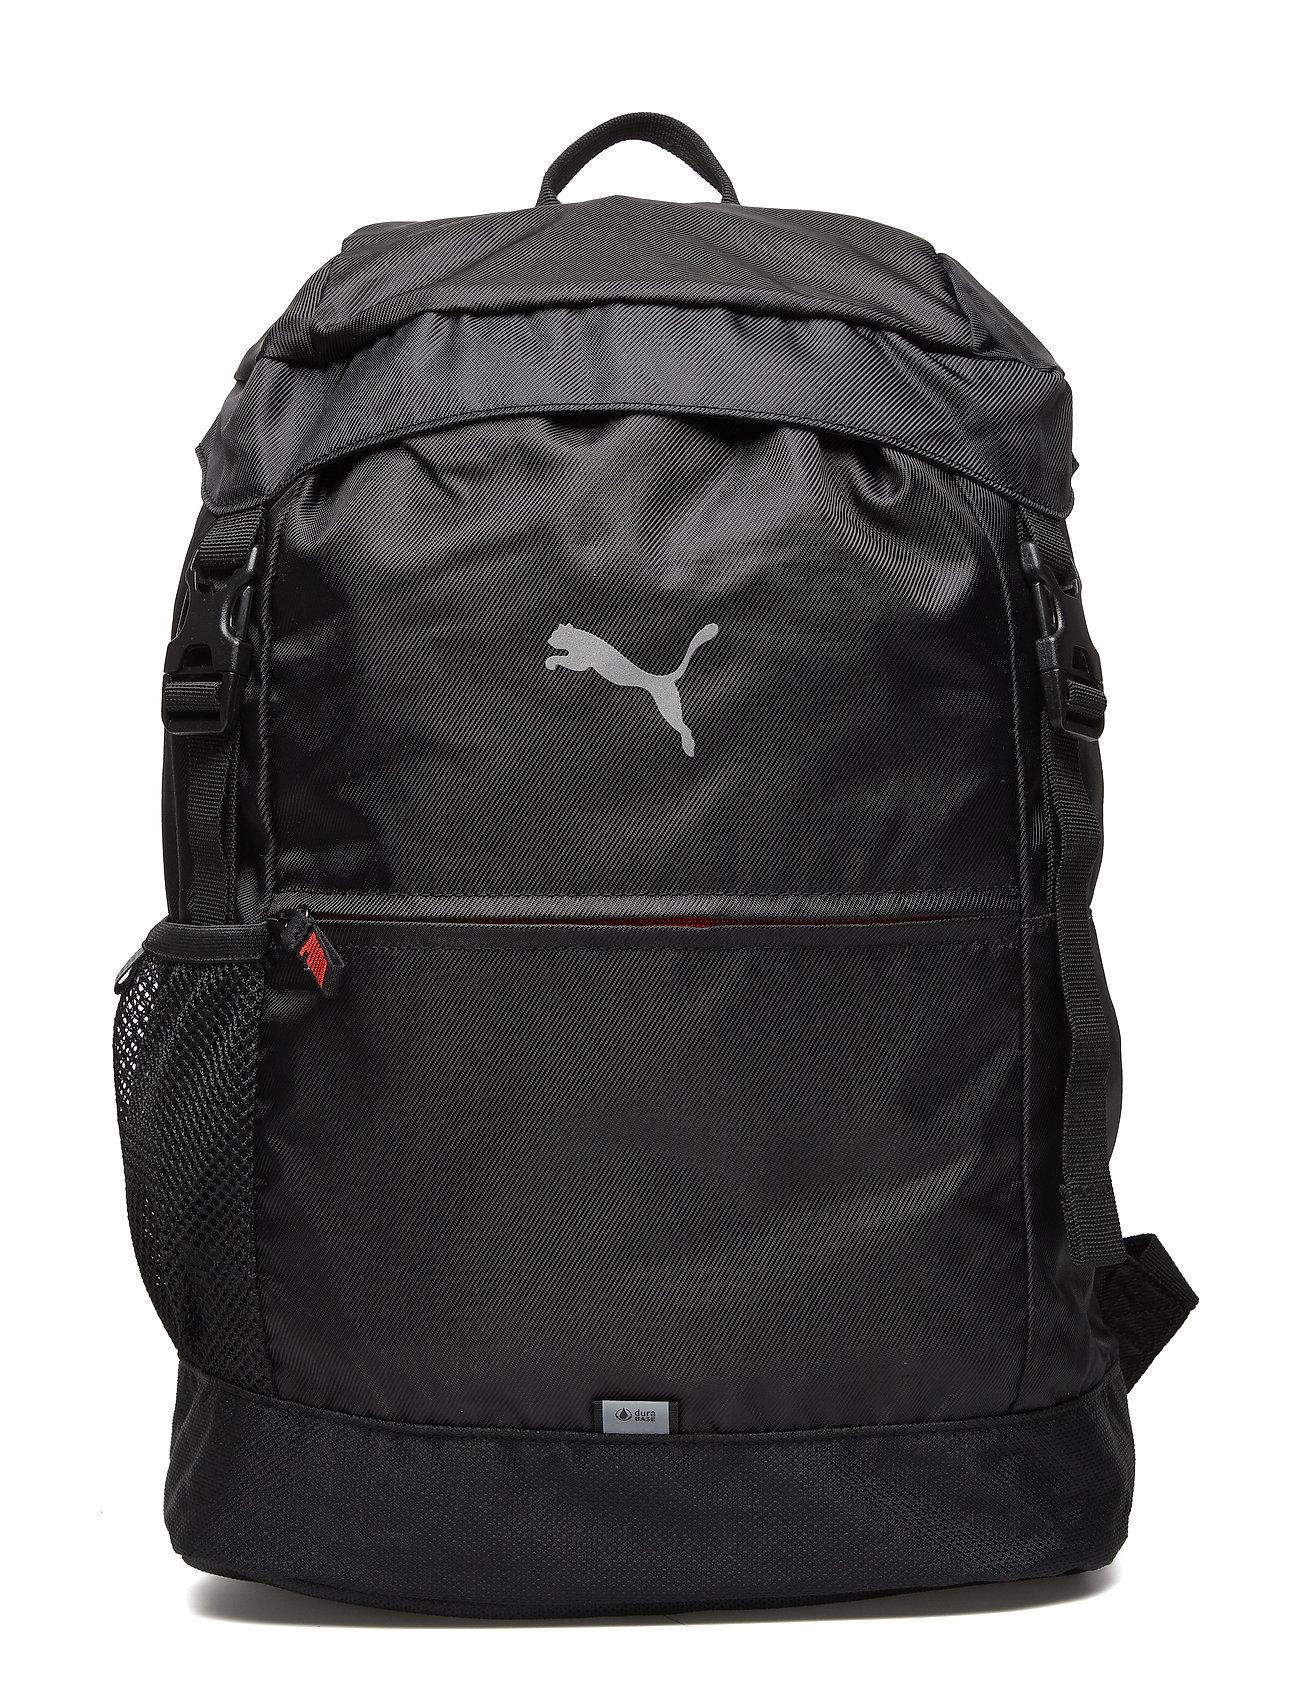 11c2a7bc97 Backpack (Puma Black) (60 €) - PUMA Golf -